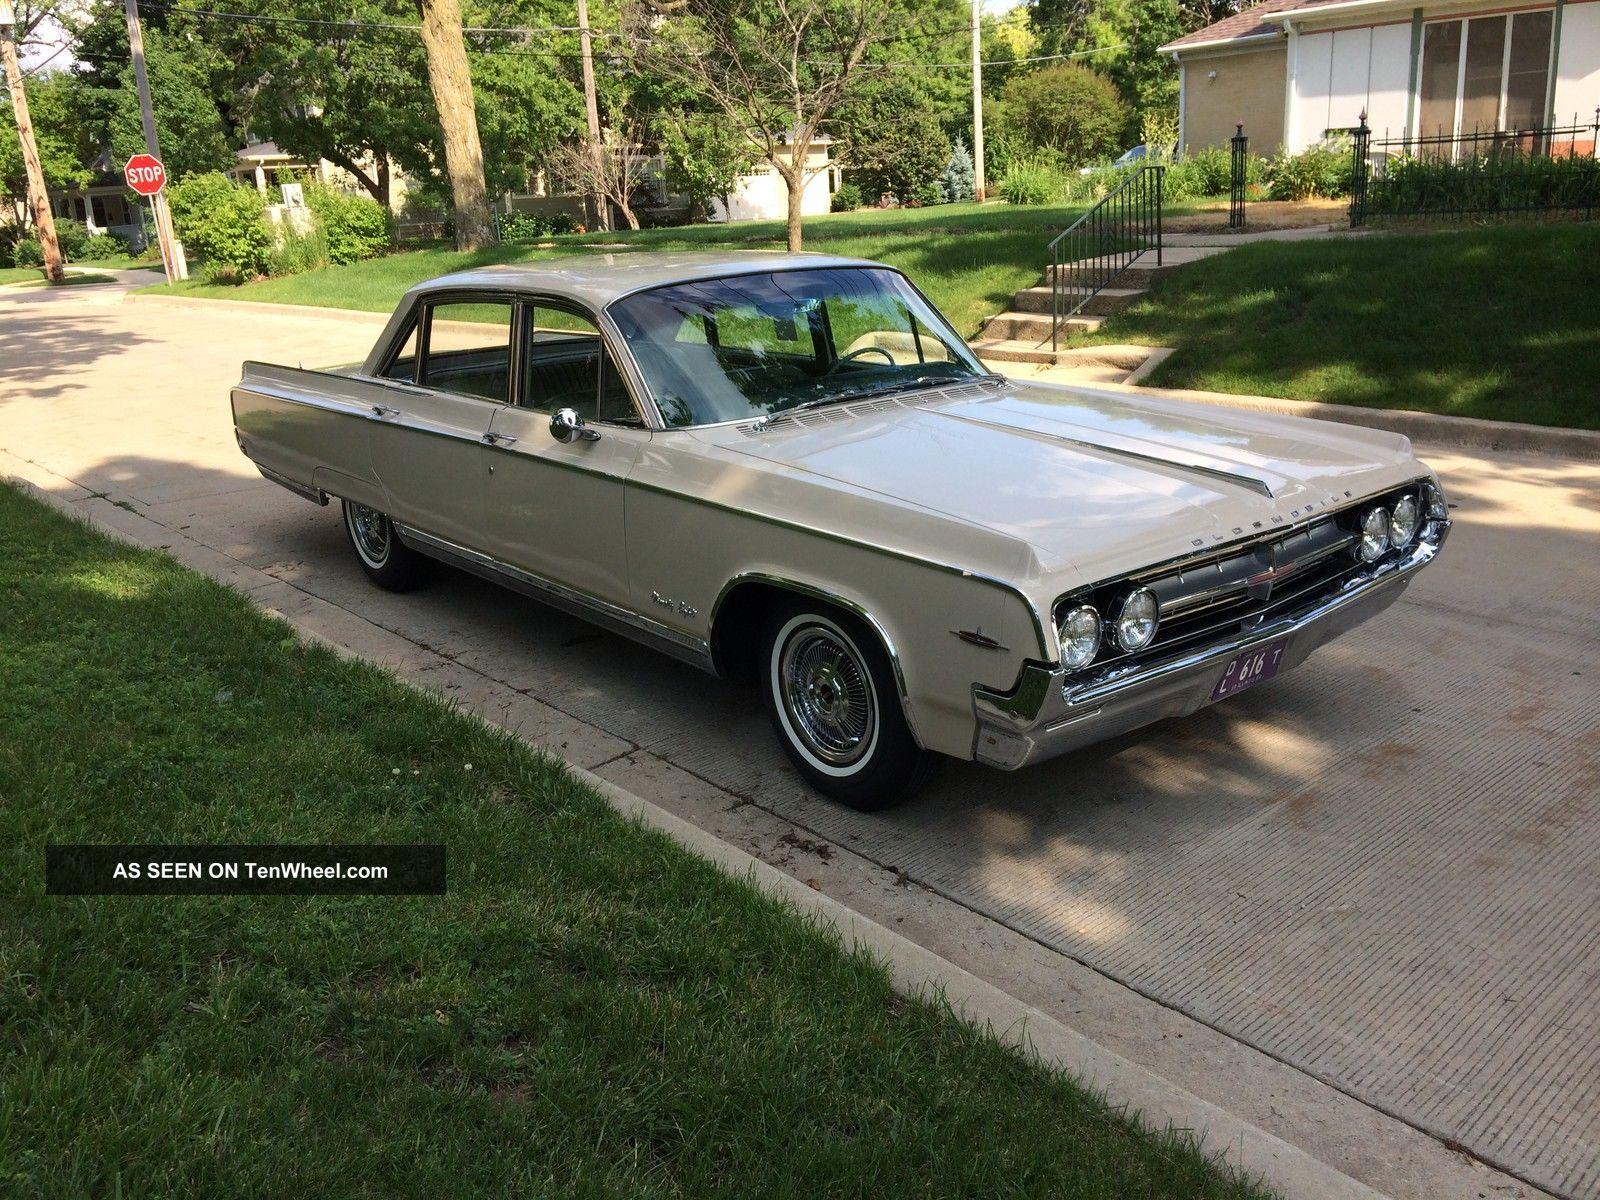 1964 Oldsmobile Ninety Eight Town Sedan 98 General Motors Classic Ninety-Eight photo